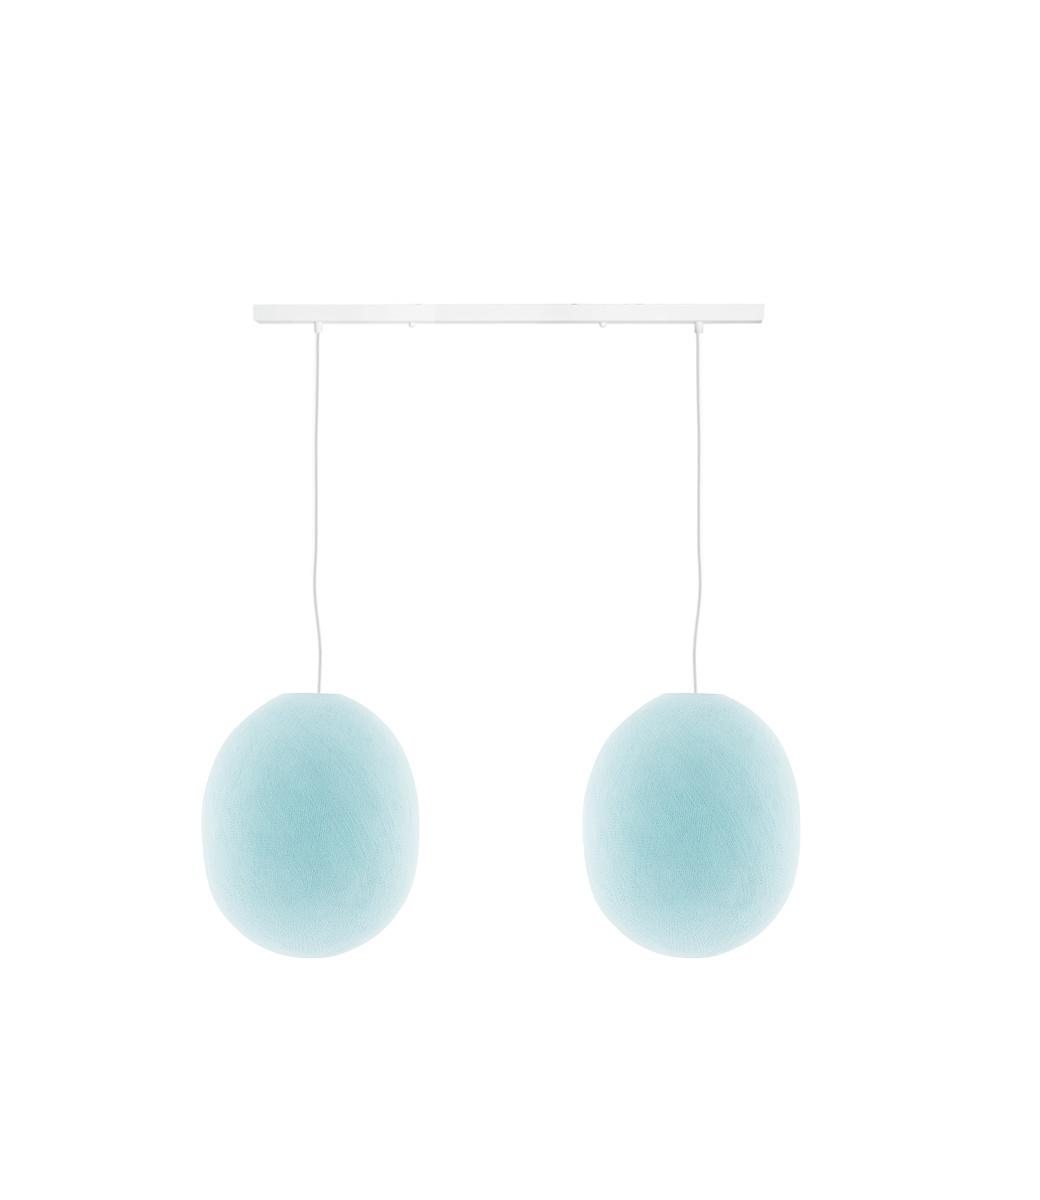 Cotton Ball Lights Tweevoudige hanglamp balk - Oval Light Aqua